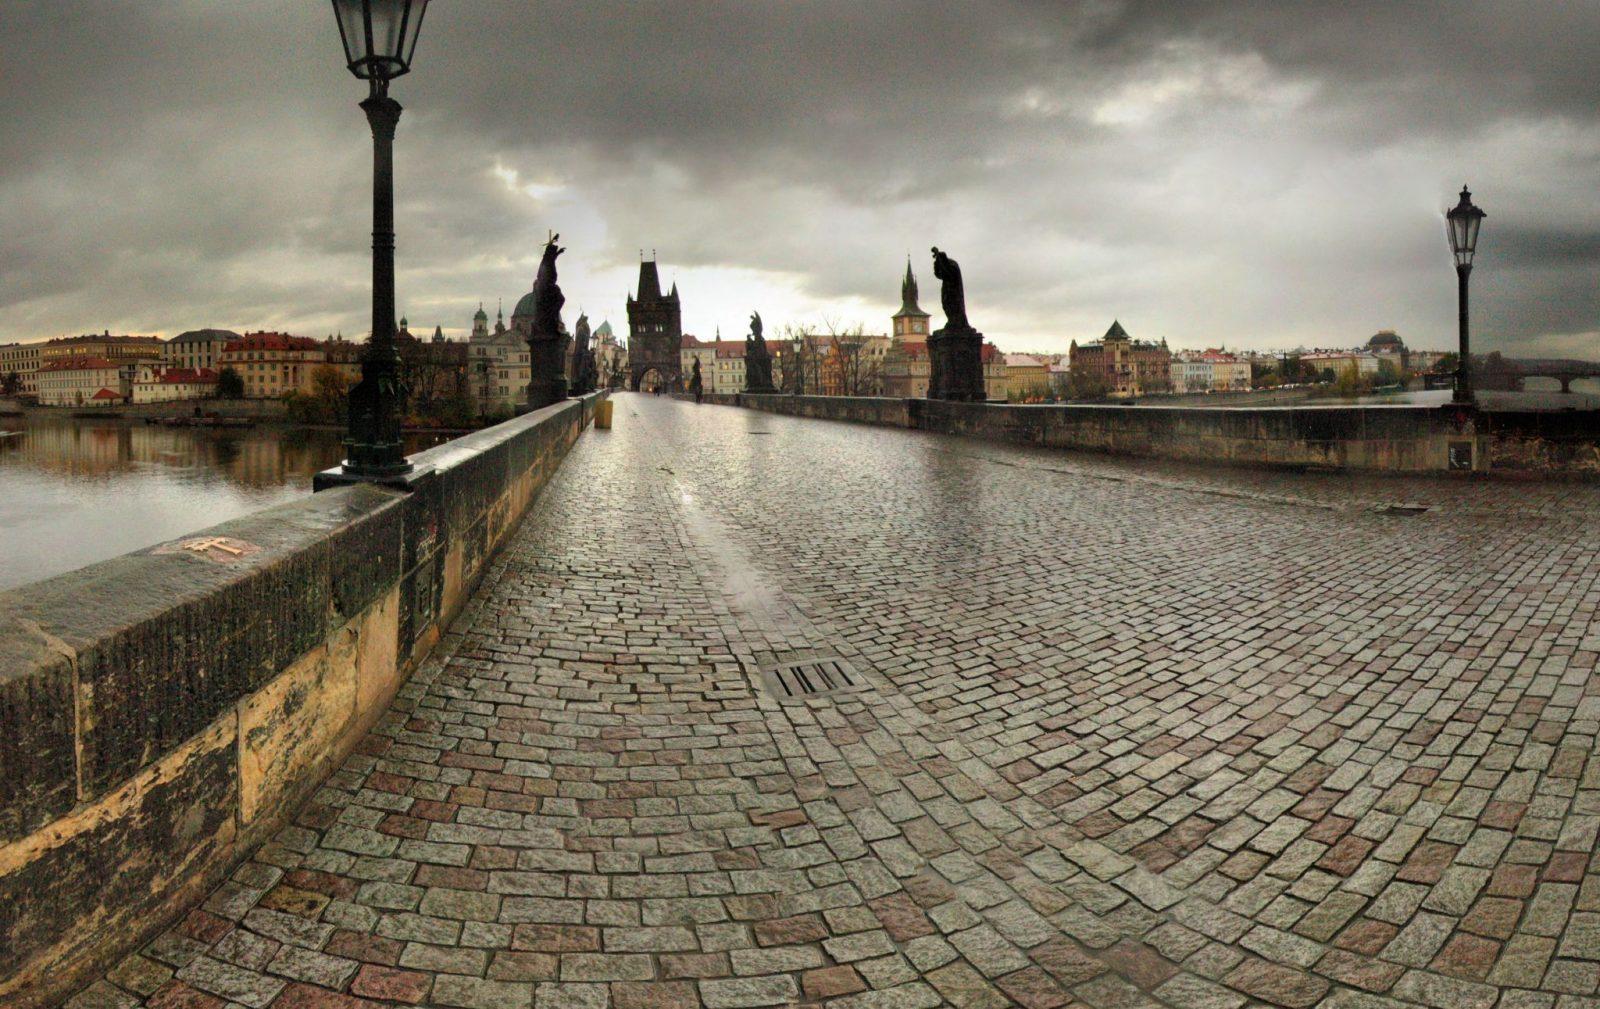 Charles Bridge, Prague. Photo by Panoramas via Flickr CC